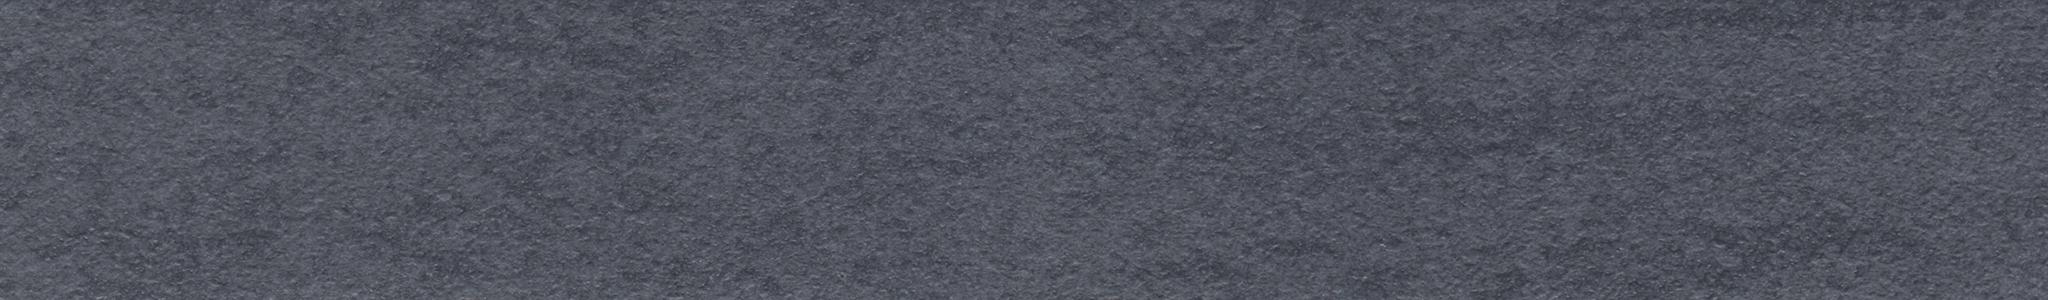 HD 299934 Кромка ABS Черный Ферро - Шагрень